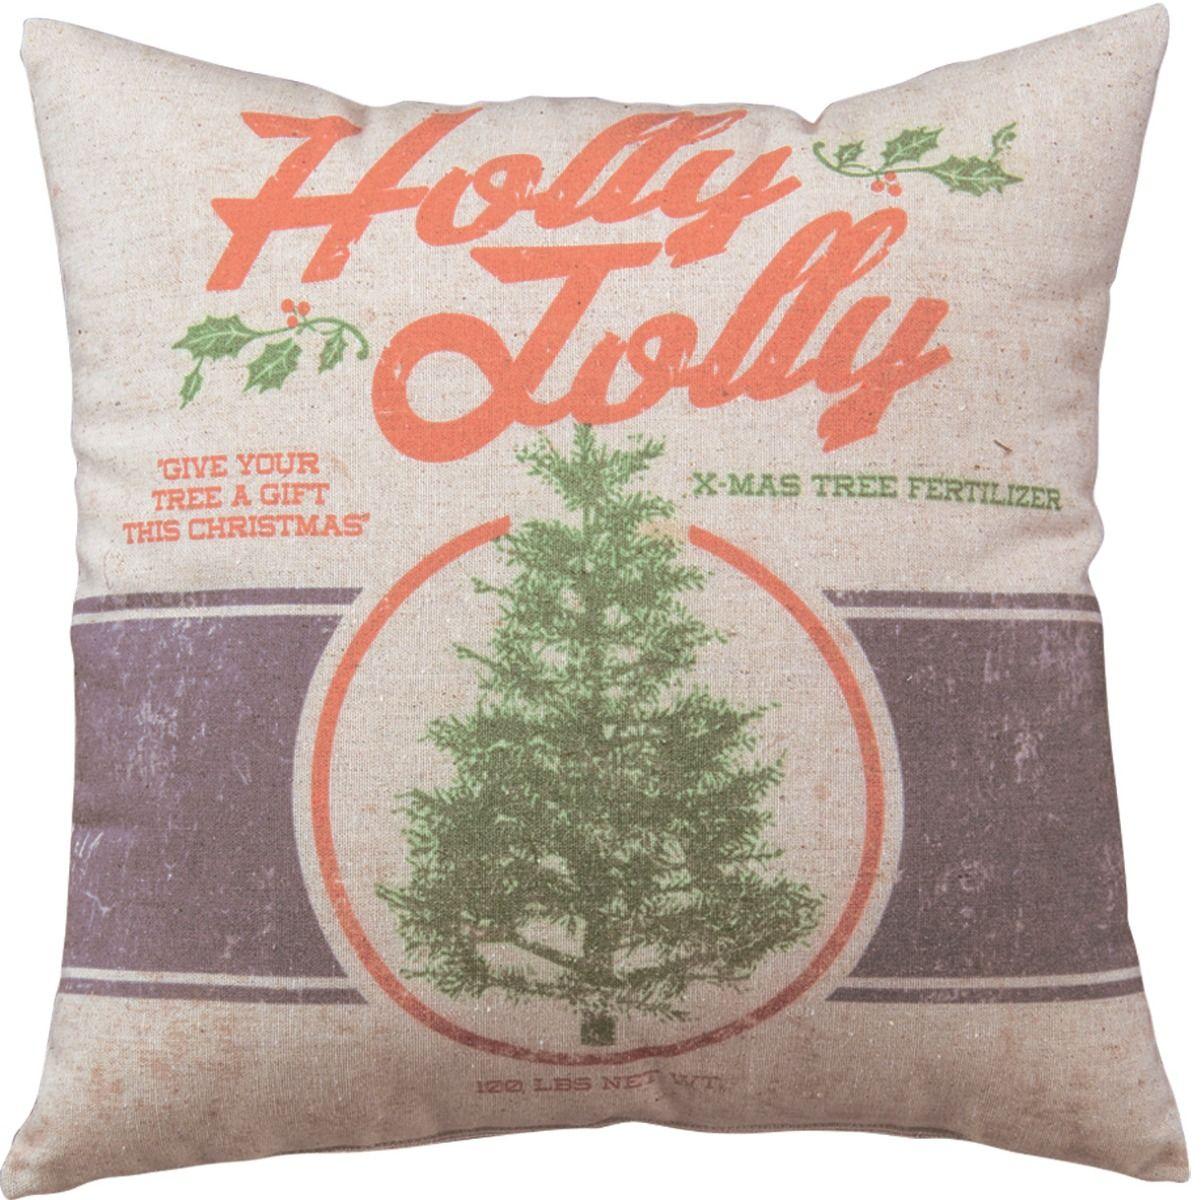 holly jolly pillow